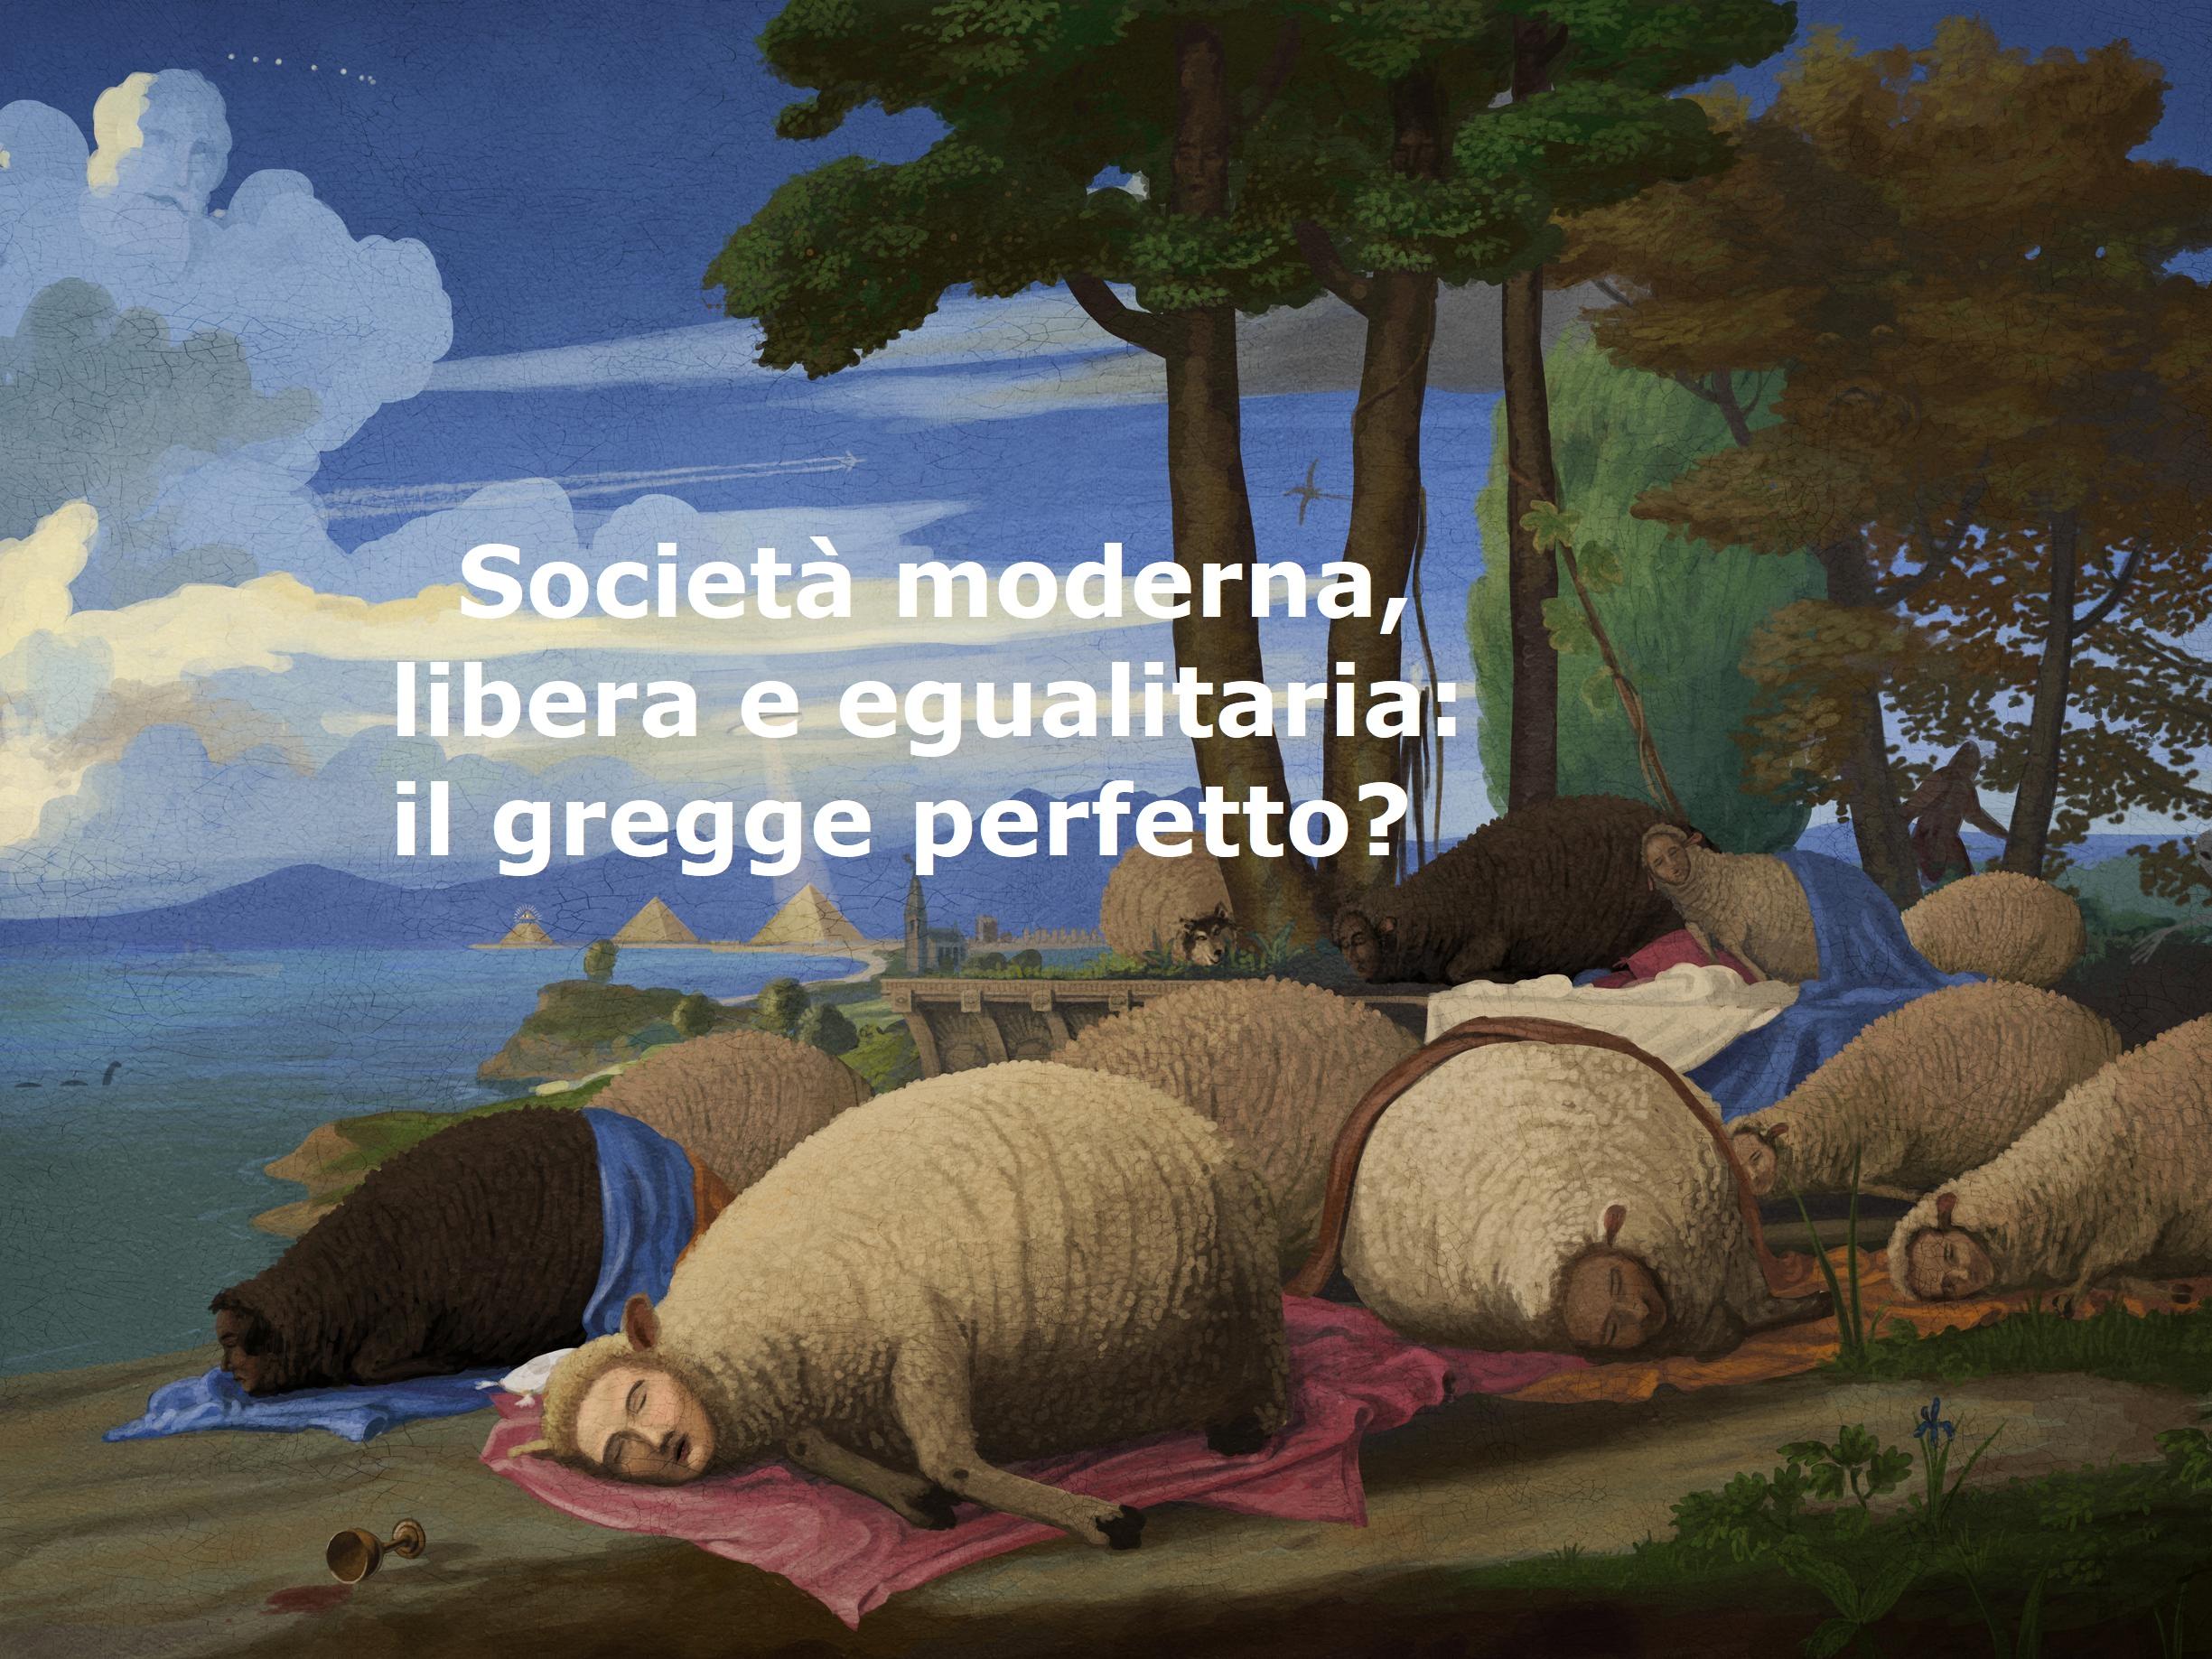 sheeple.jpeg